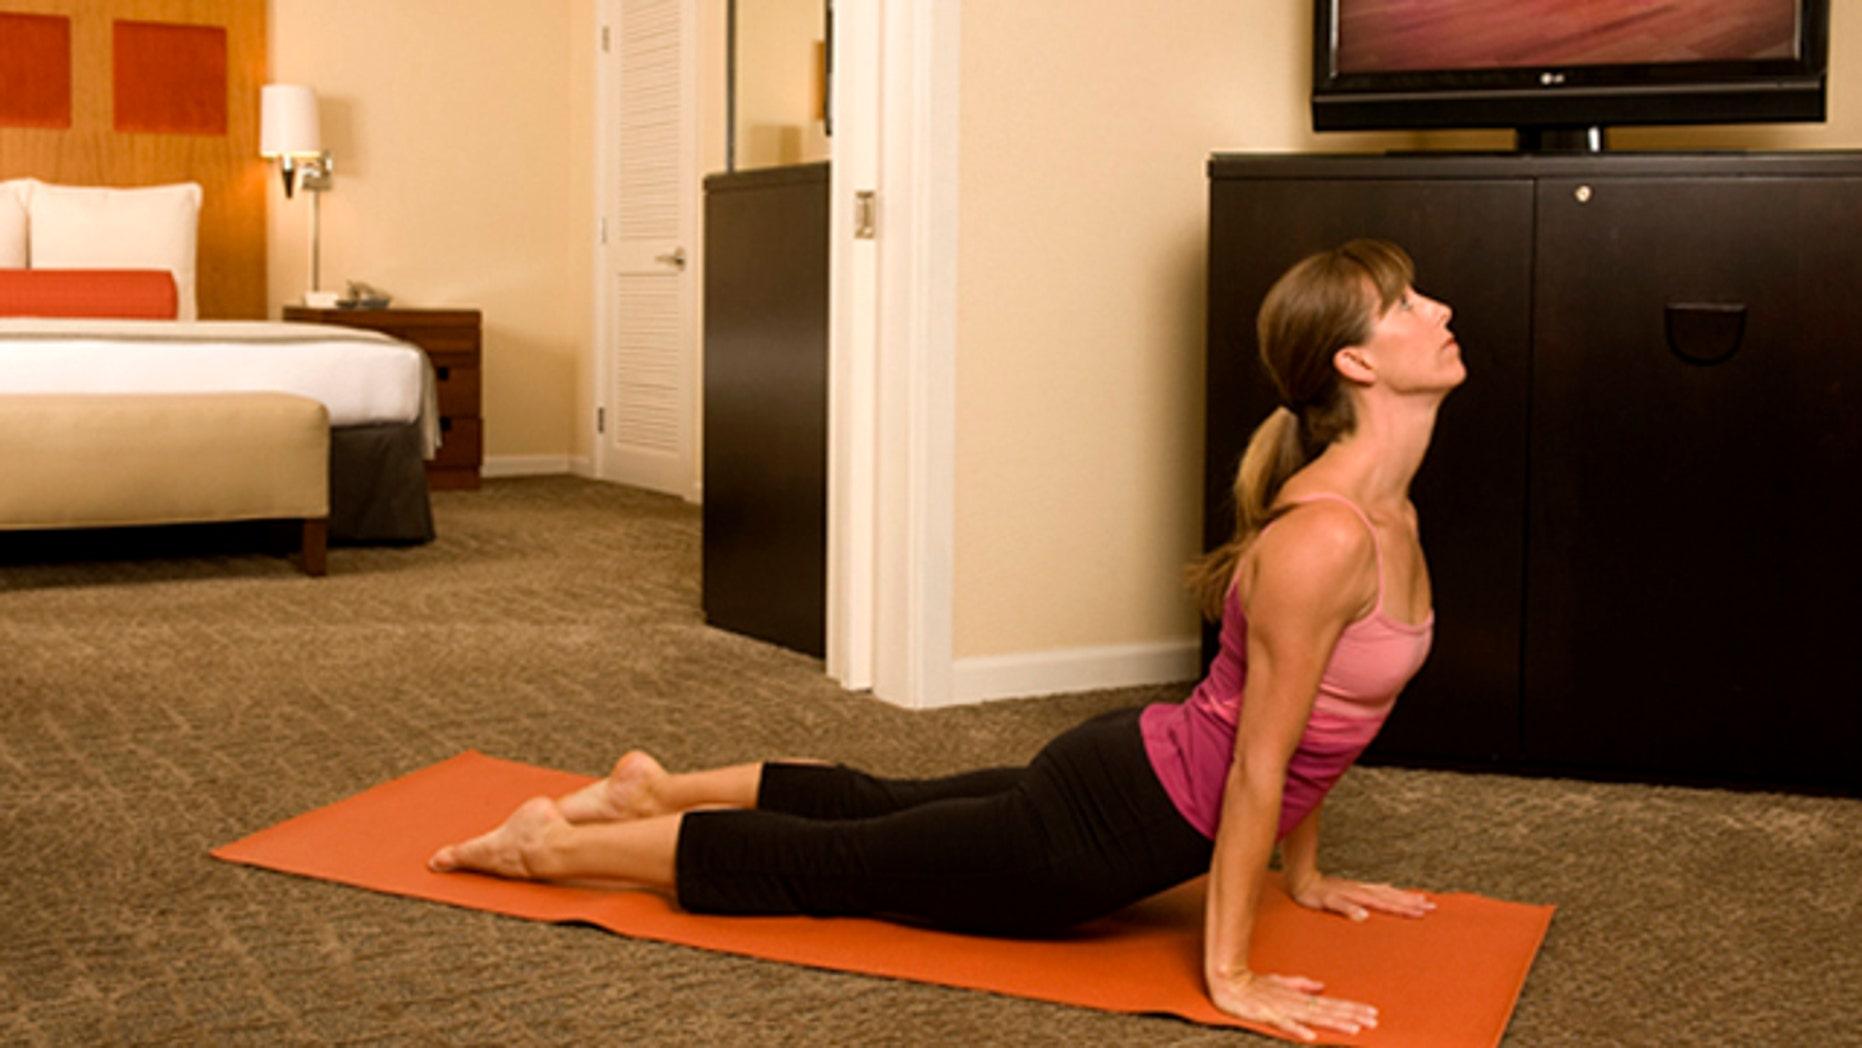 A woman practices yoga in Kimpton's Hotel Palomar in San Francisco, California.